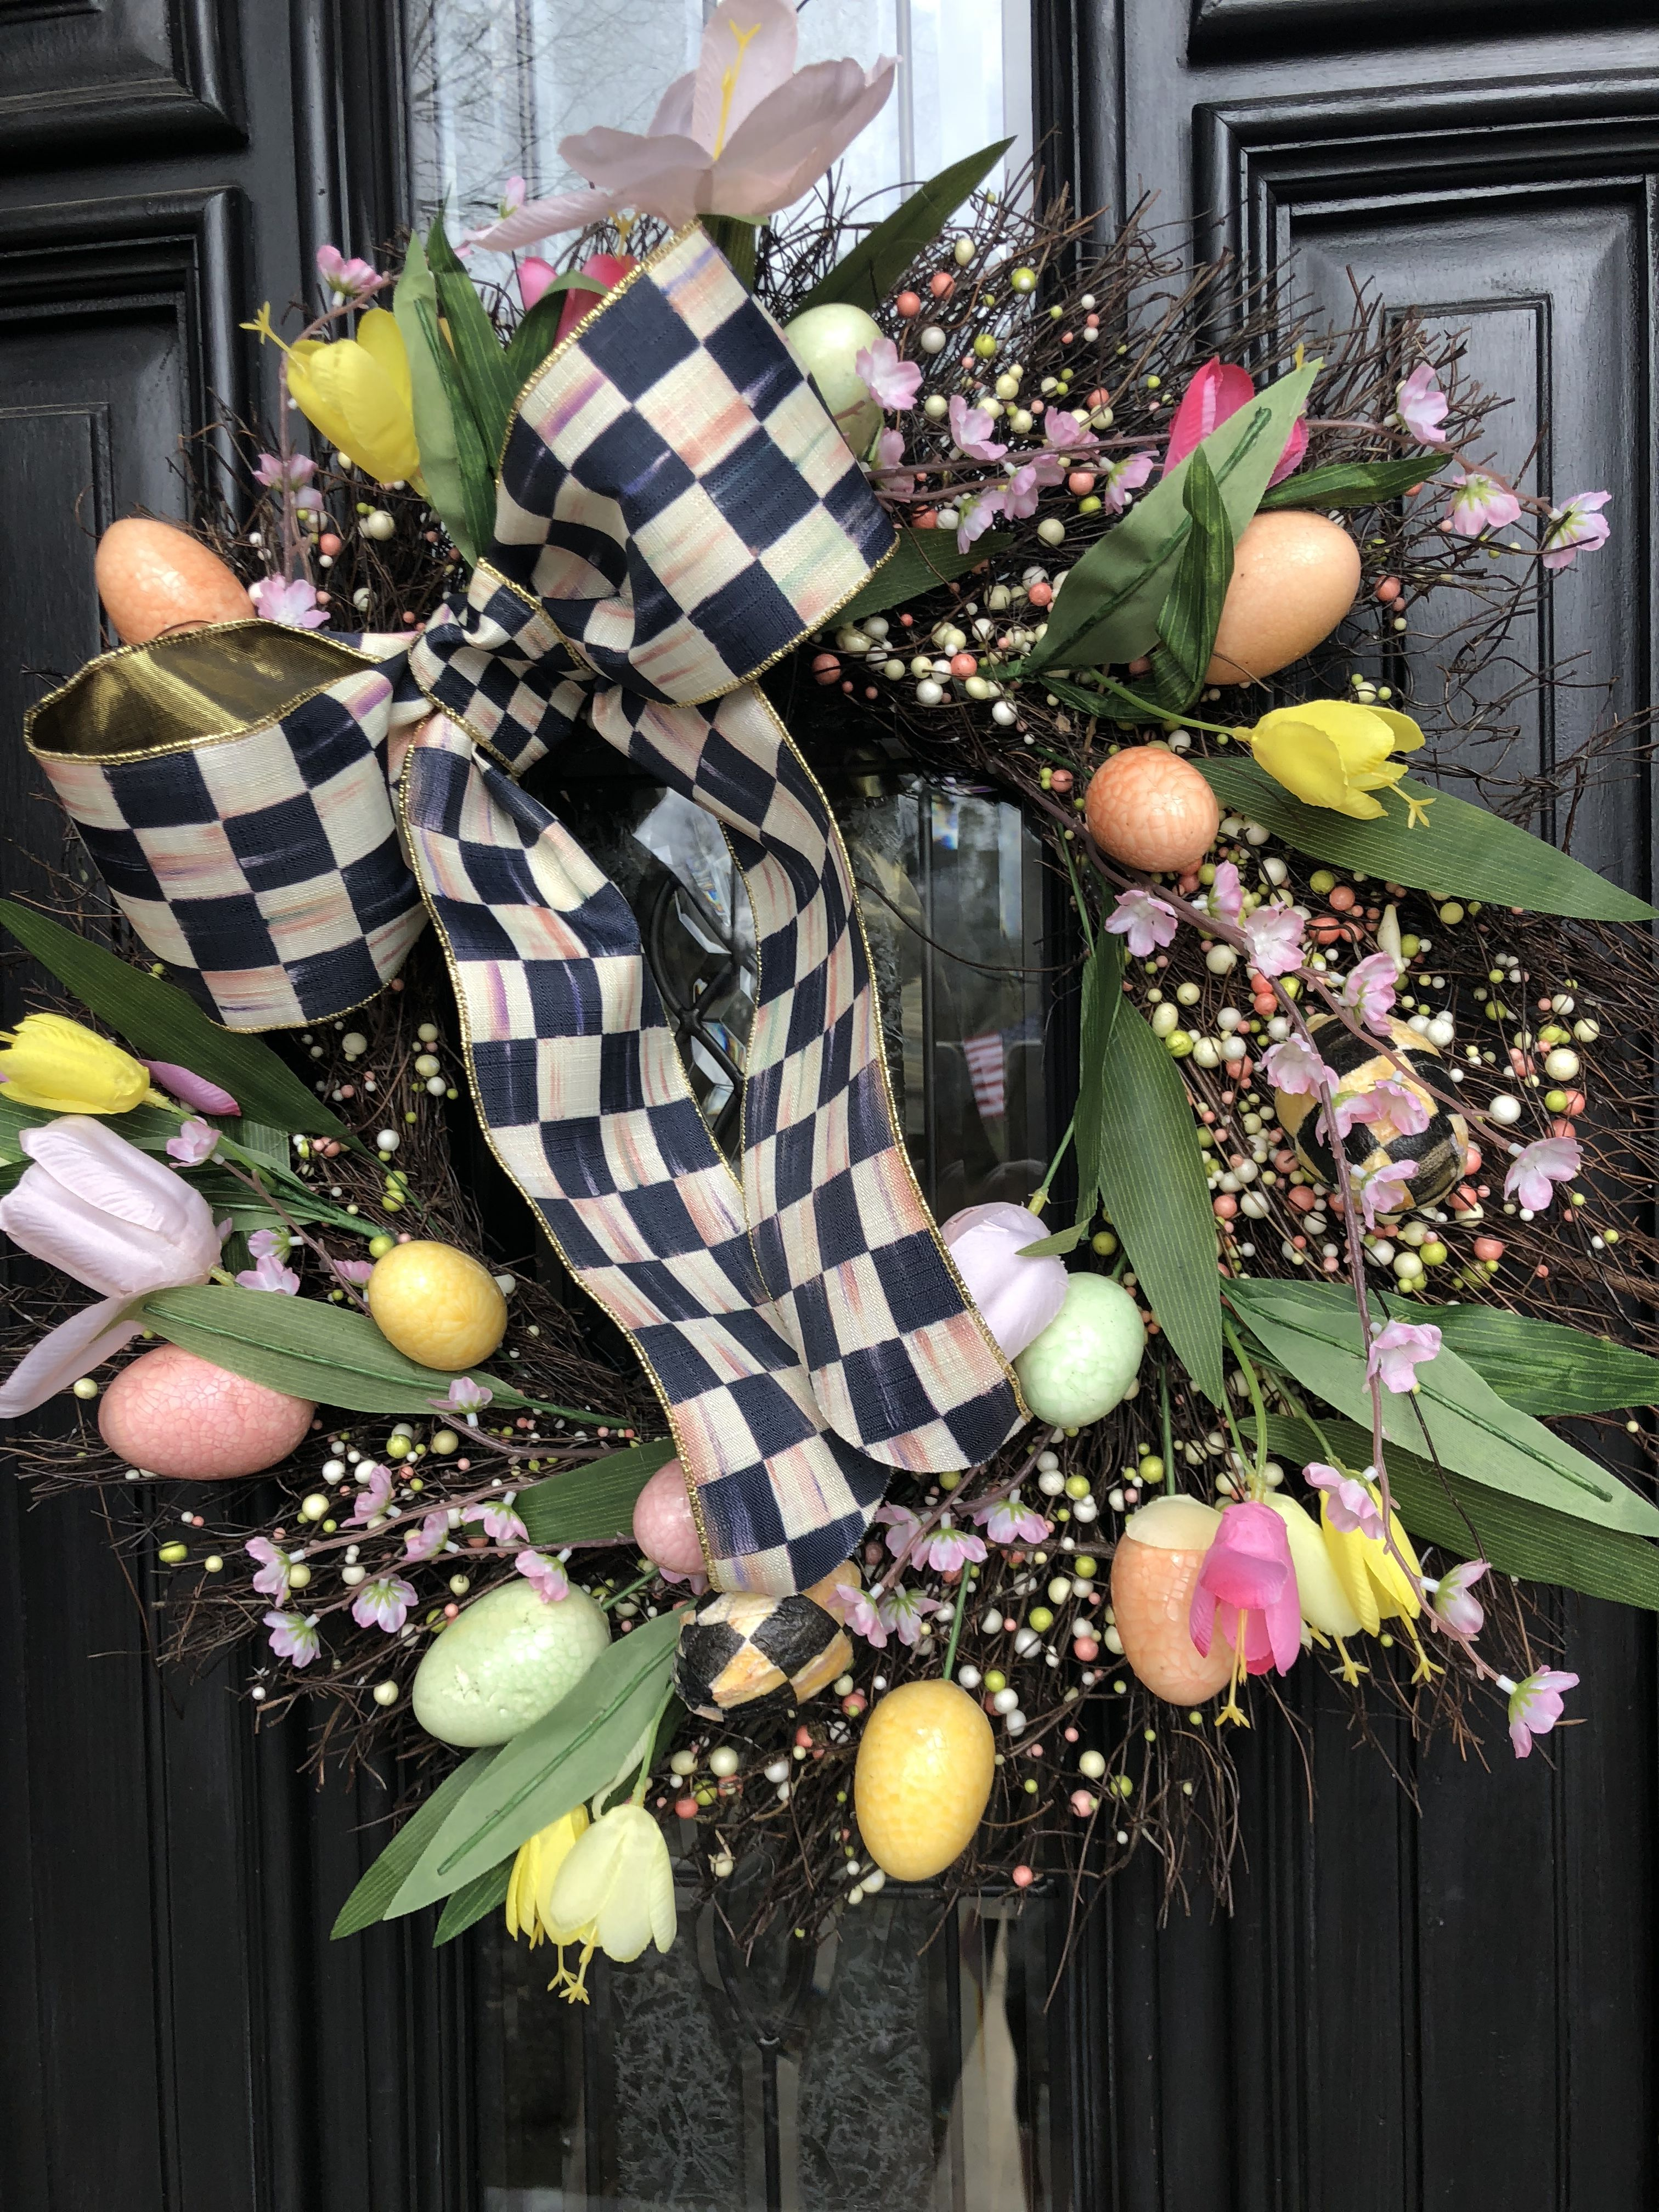 My Spring Bonquet Door Hanger And Mackenzie Childs Napkin!